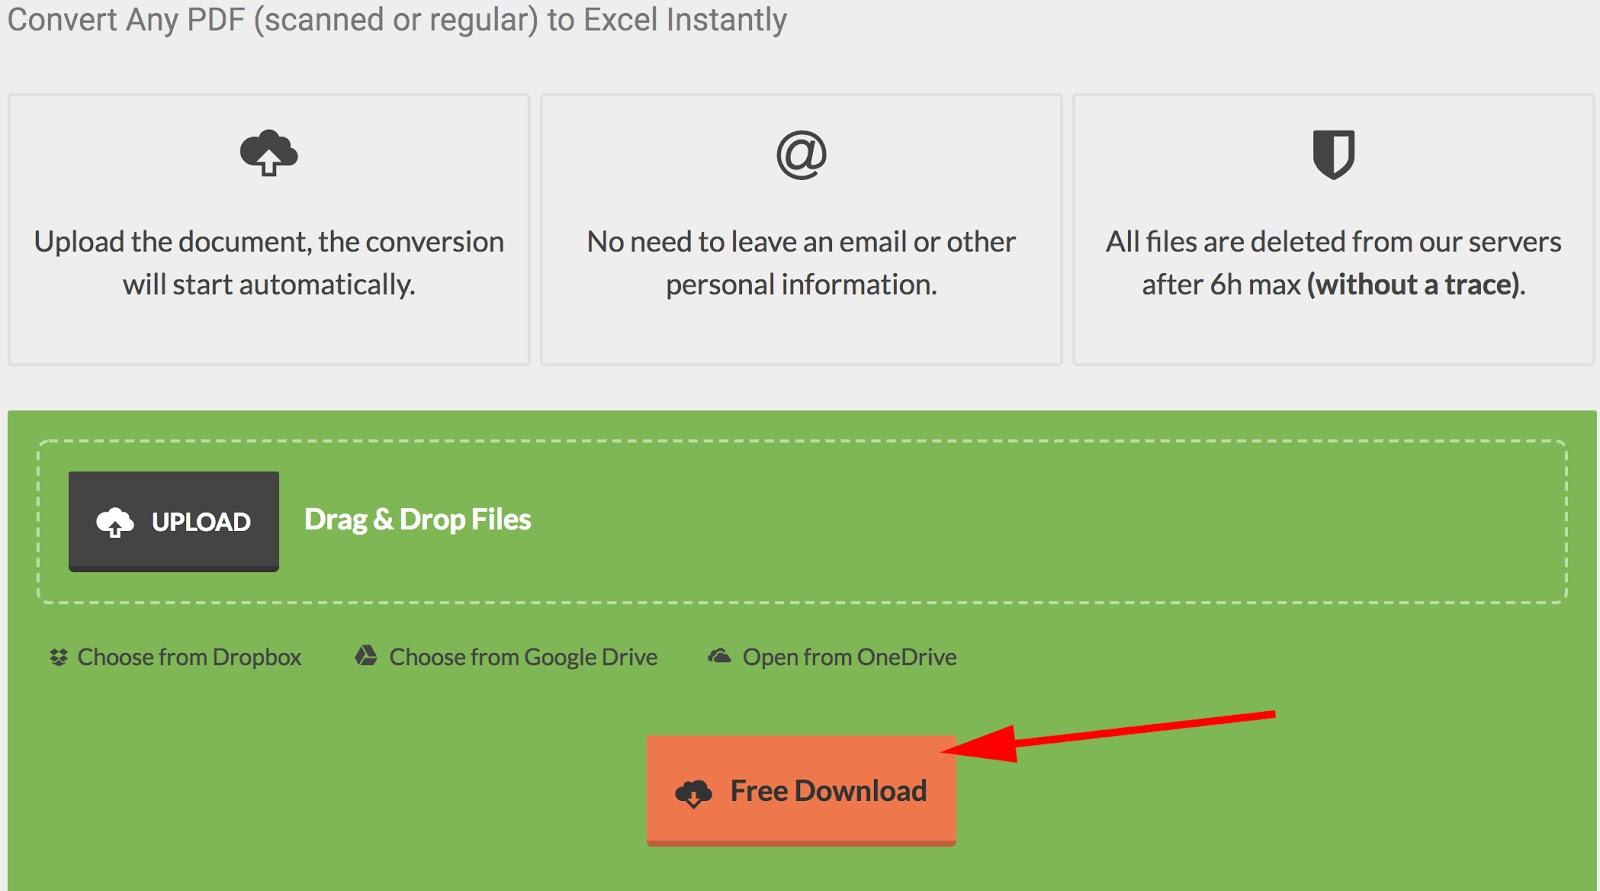 Orange Free Download button on PDFtoExcel.com